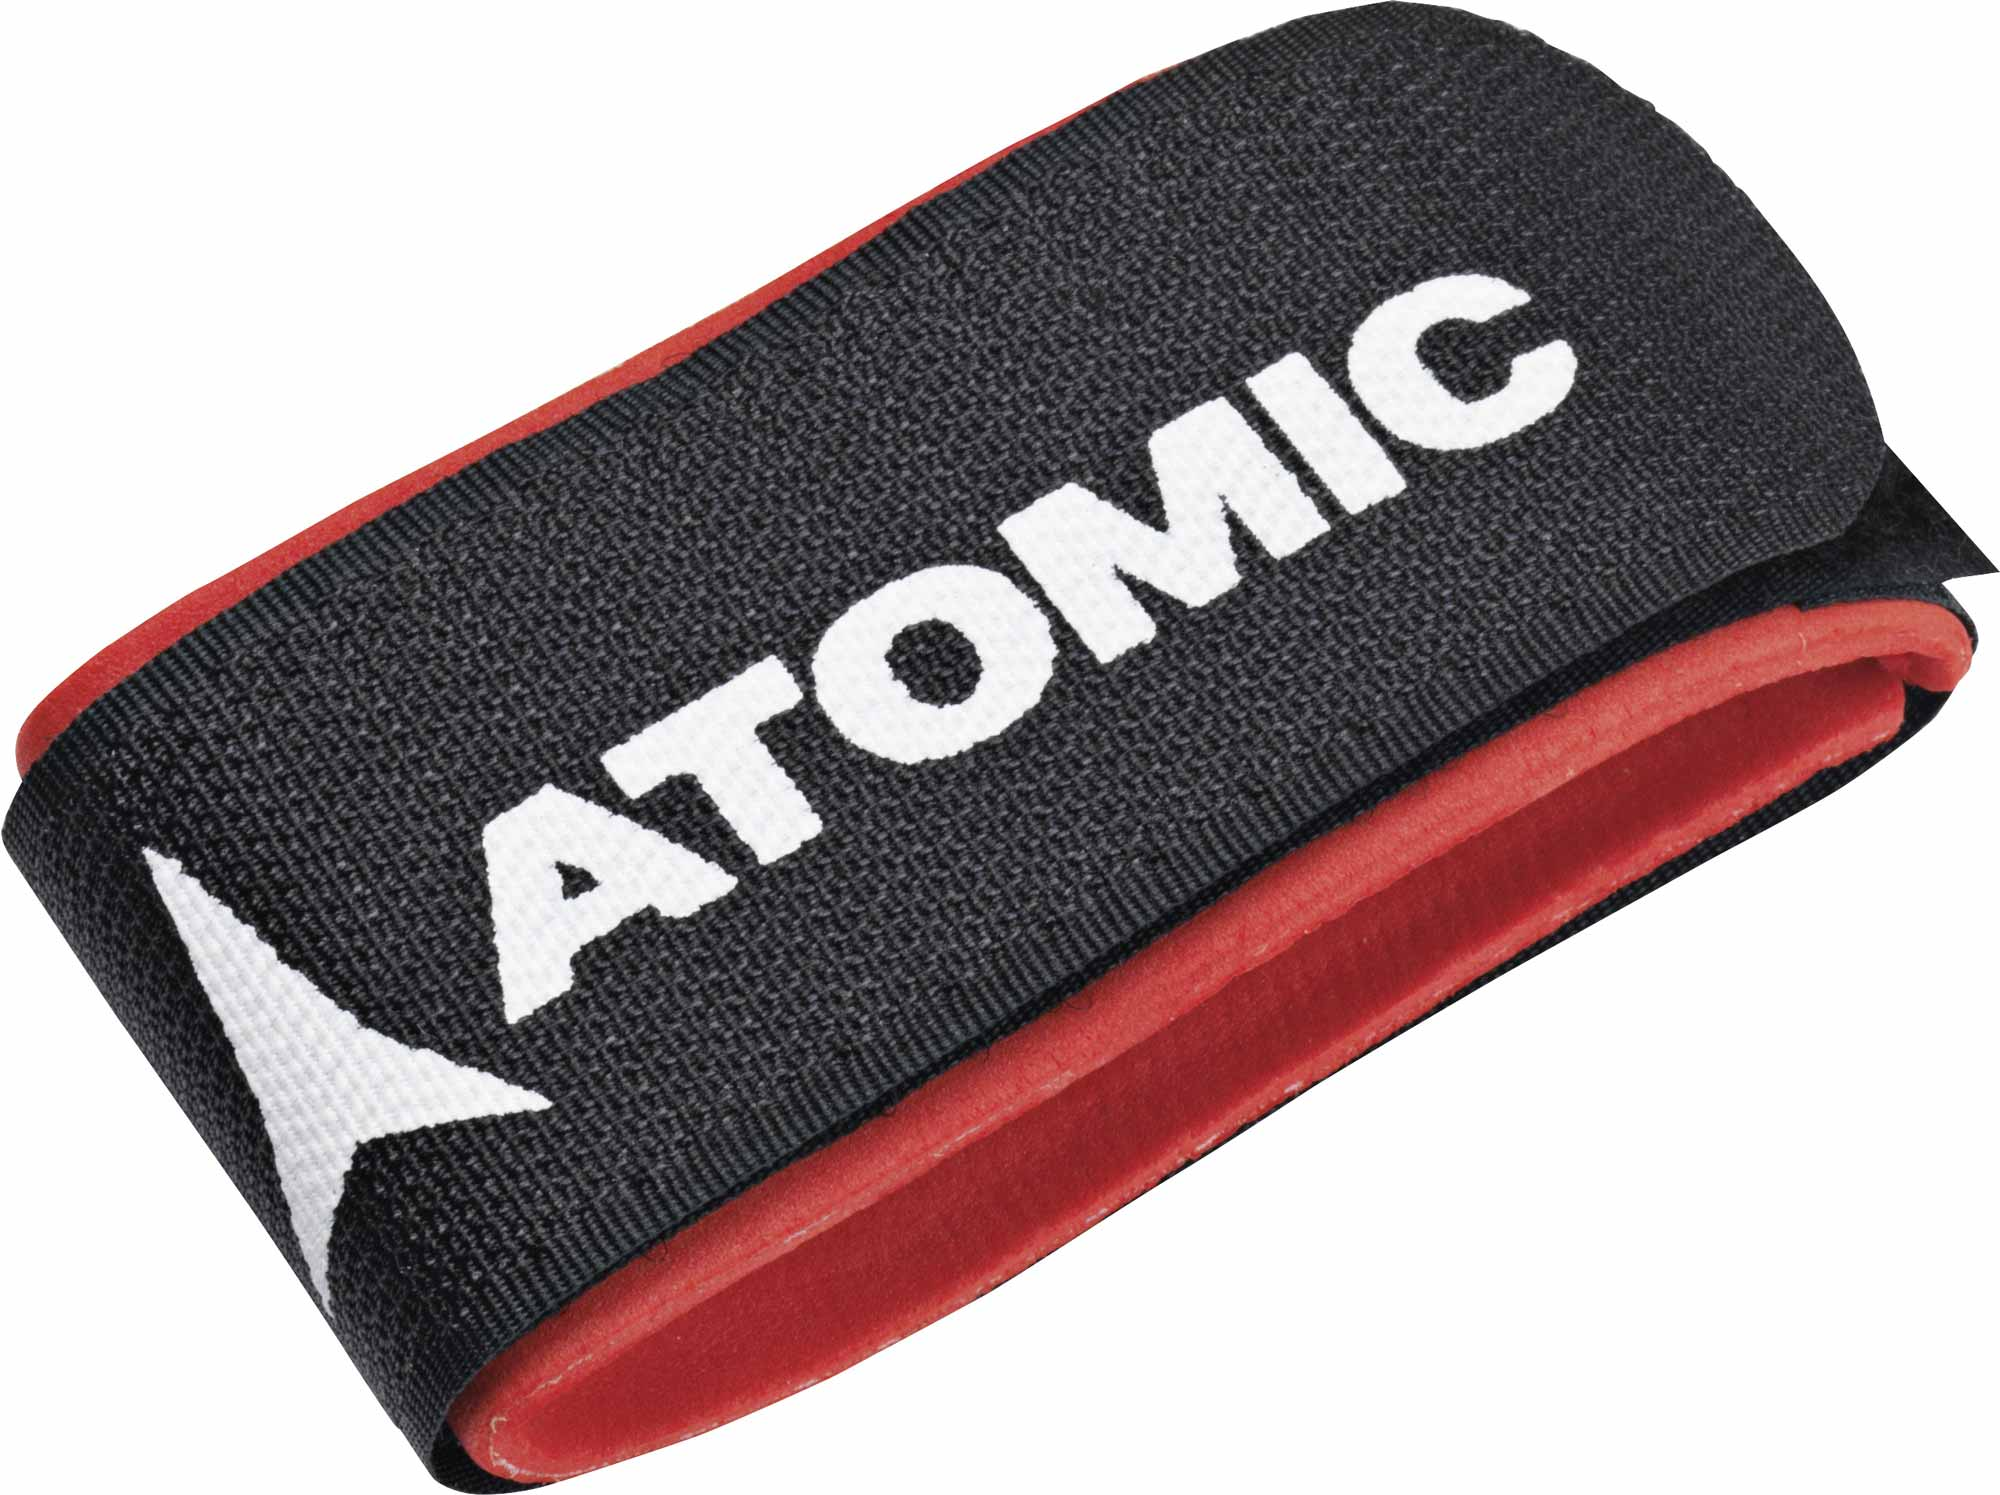 Atomic Economy Skifix - Alpin Klettband - 1 Stück